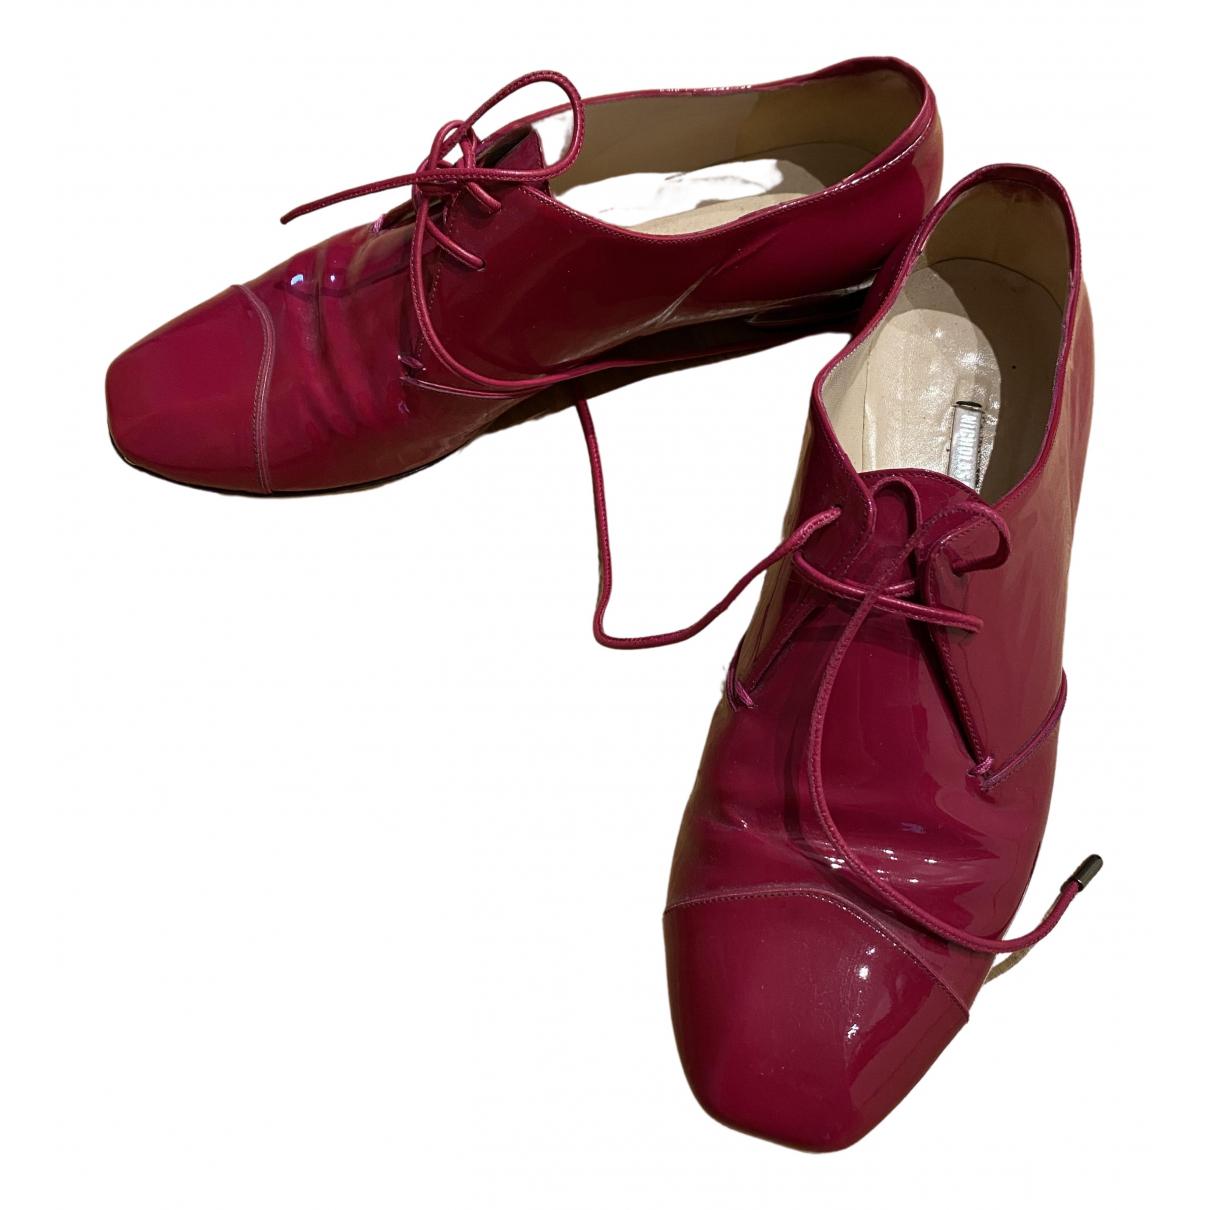 Nicholas Kirkwood \N Pink Patent leather Lace ups for Women 37 EU